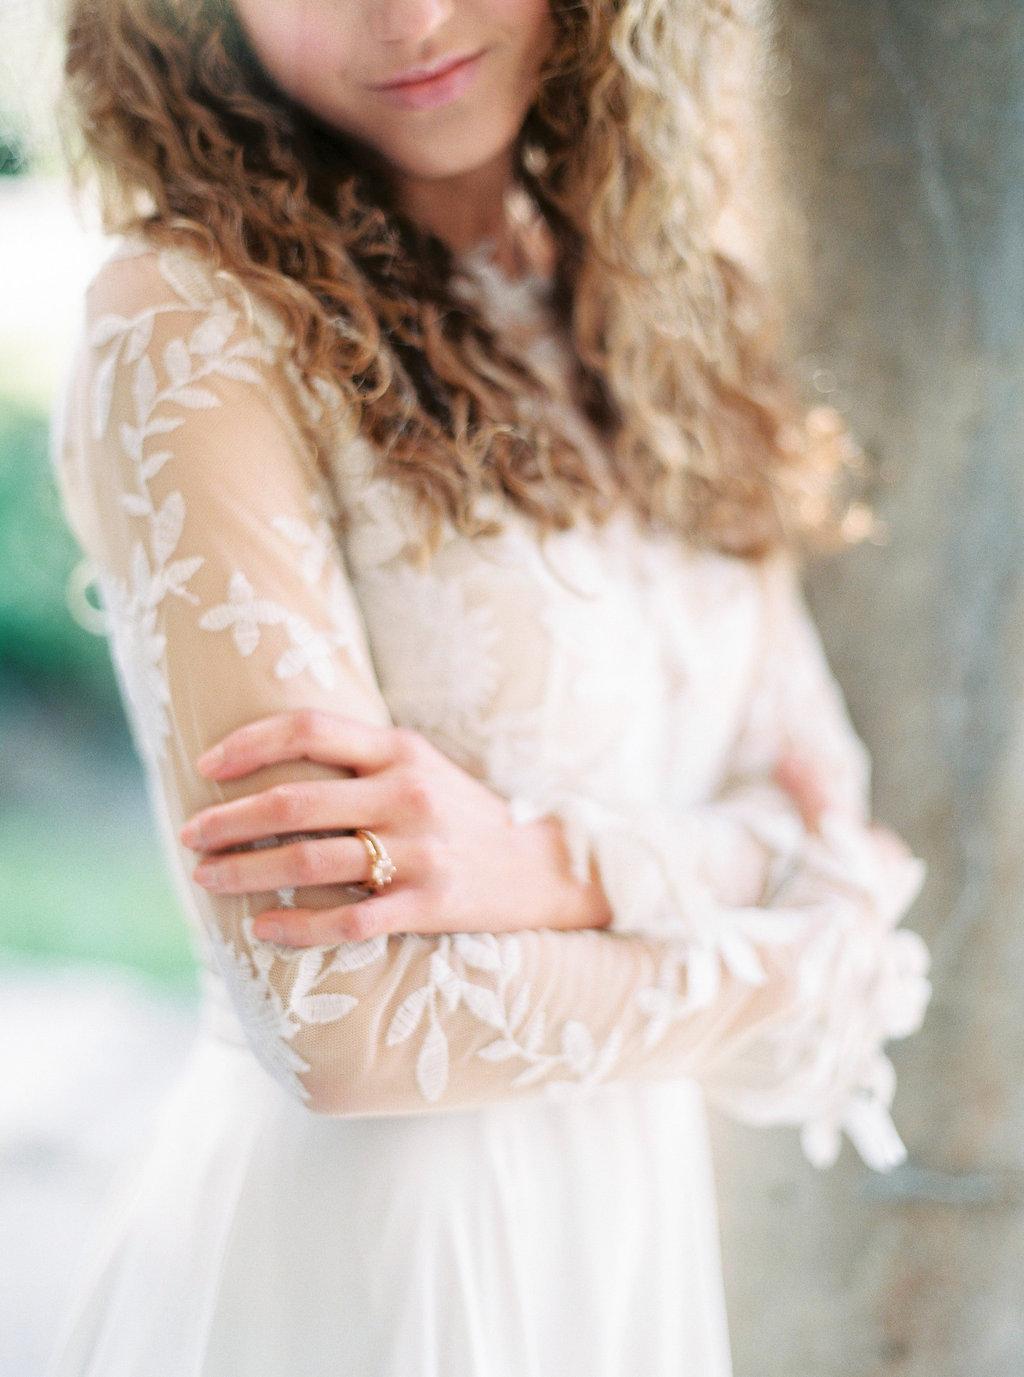 WeddingSparrow-PhotographybyIntoTheLight-Macias-lordan.com-ONLINESHARING(23of50).jpg